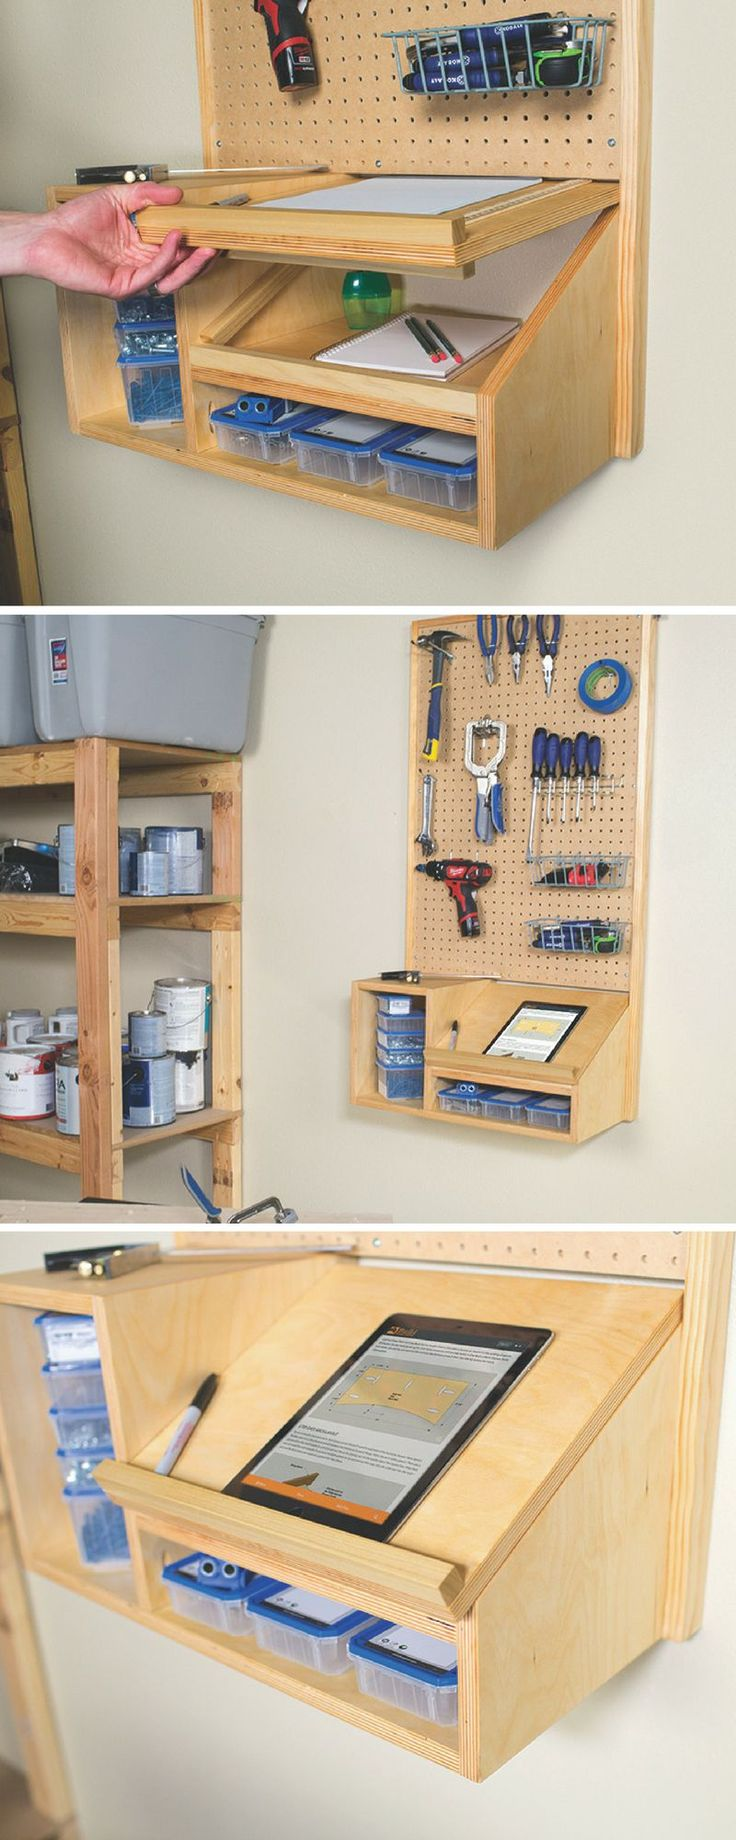 Wood Profits Keeping your workspace organized